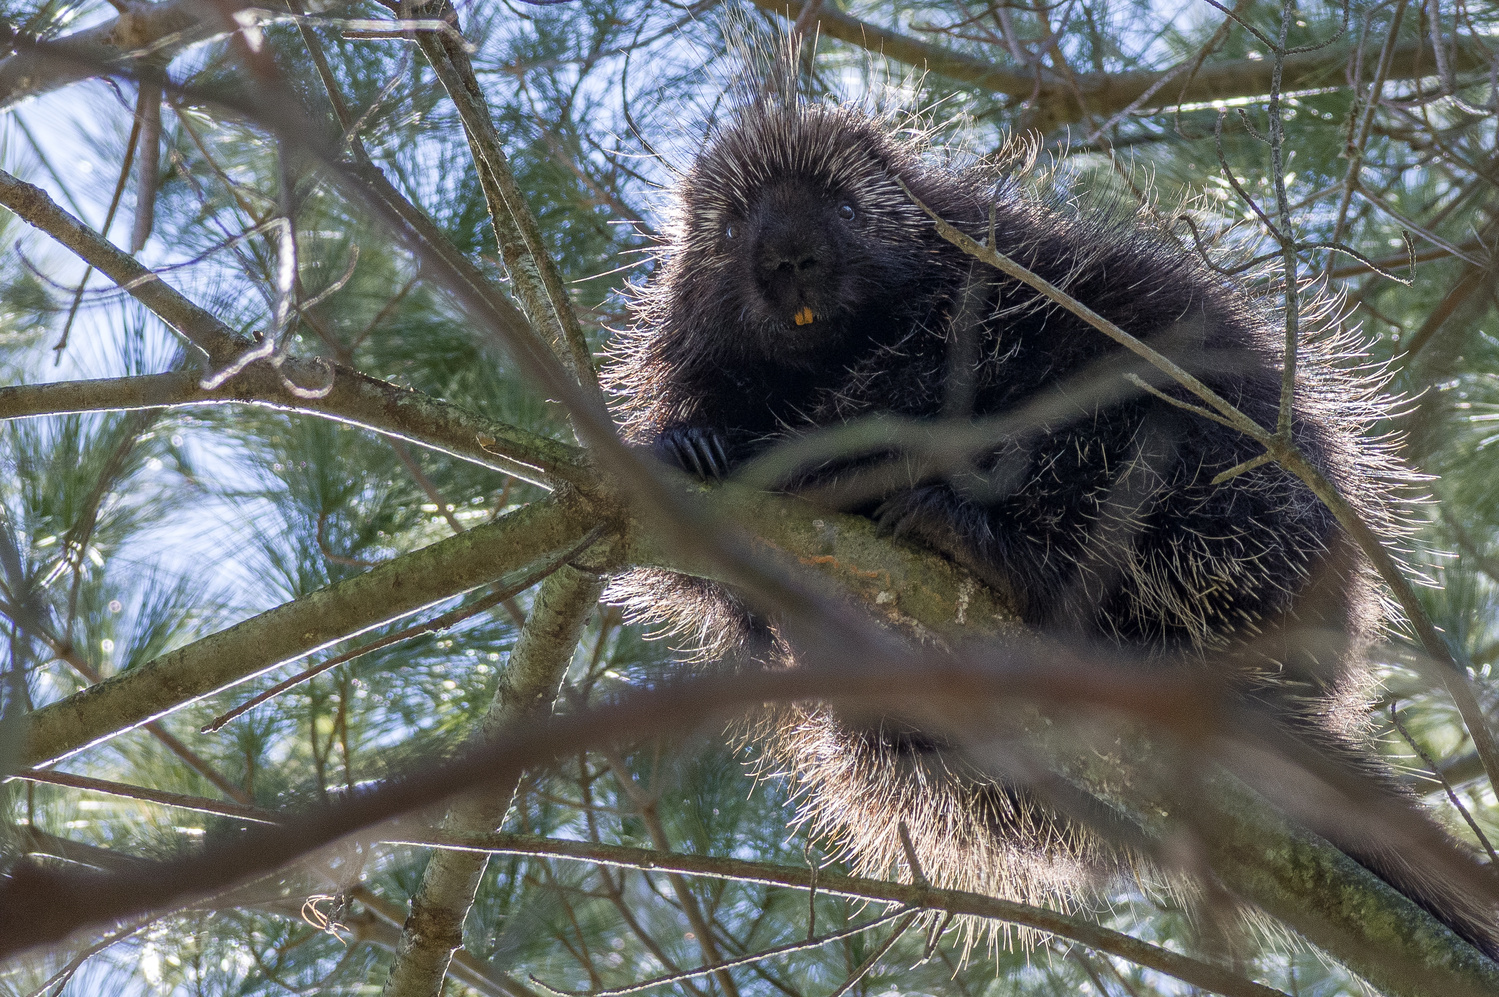 Porcupine by Jason Orr